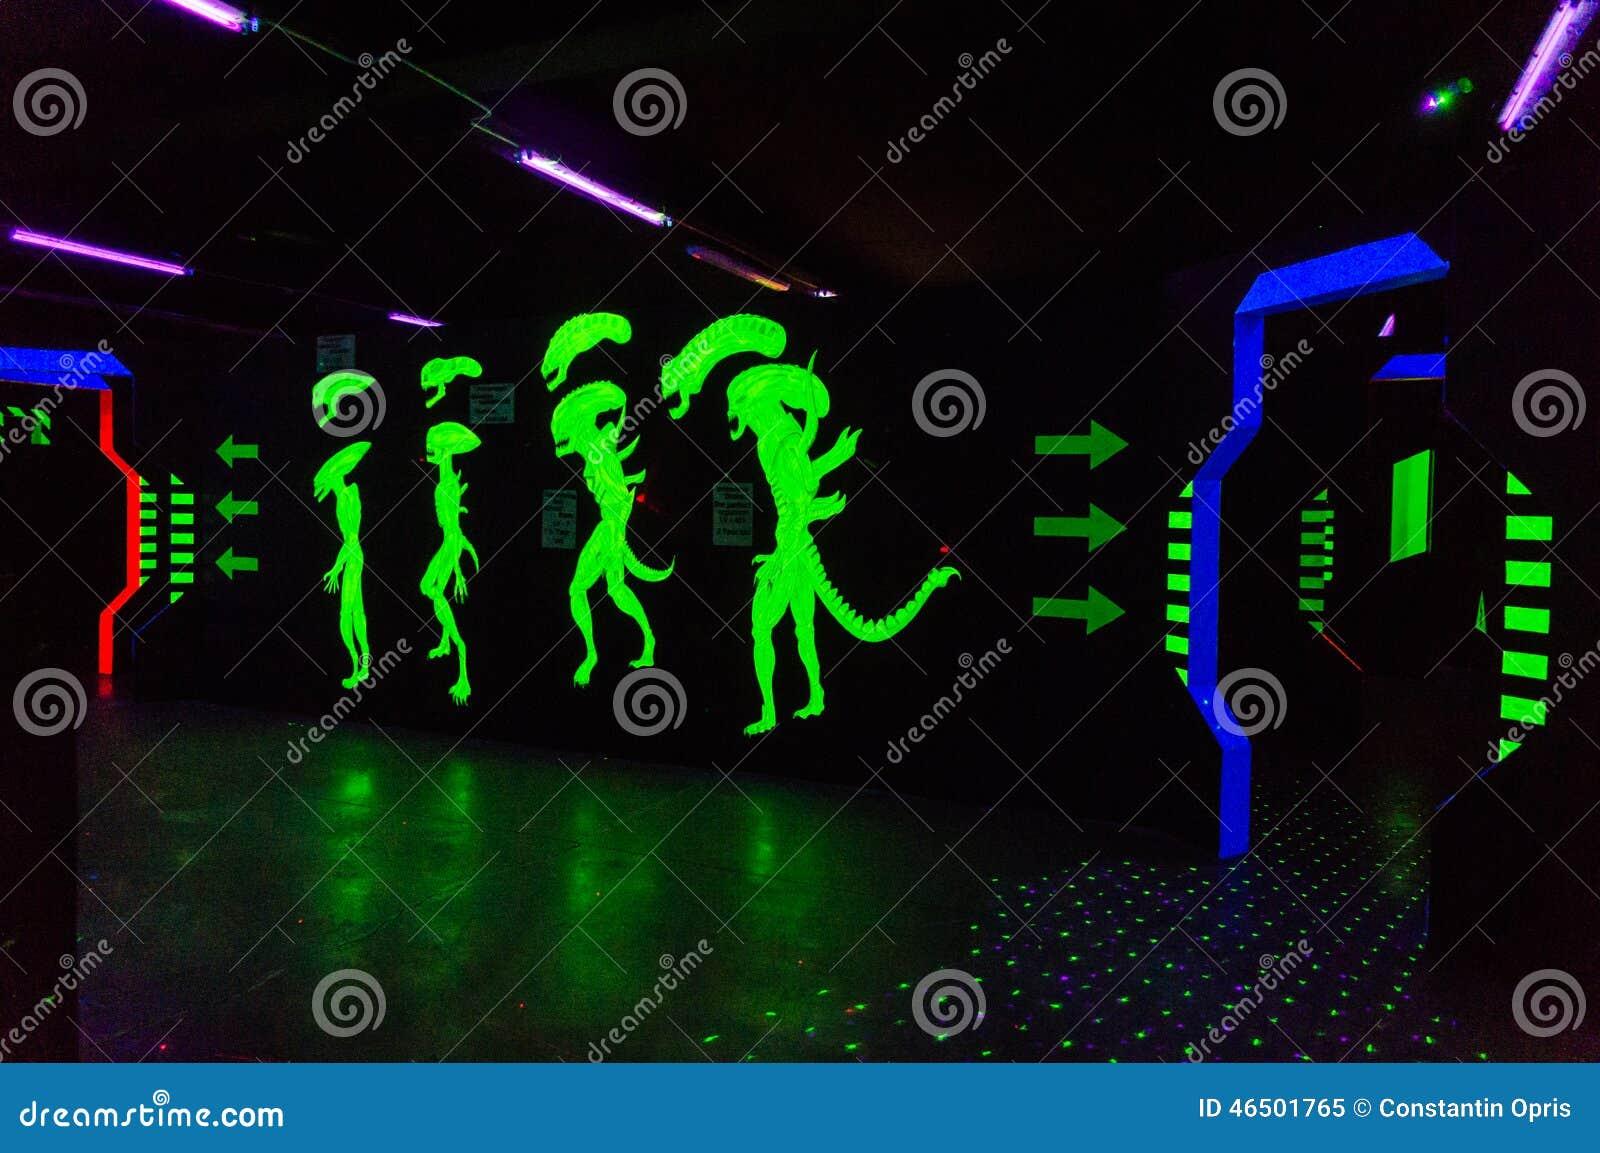 Alien Laser Tag Arena Editorial Image - Image: 46501765